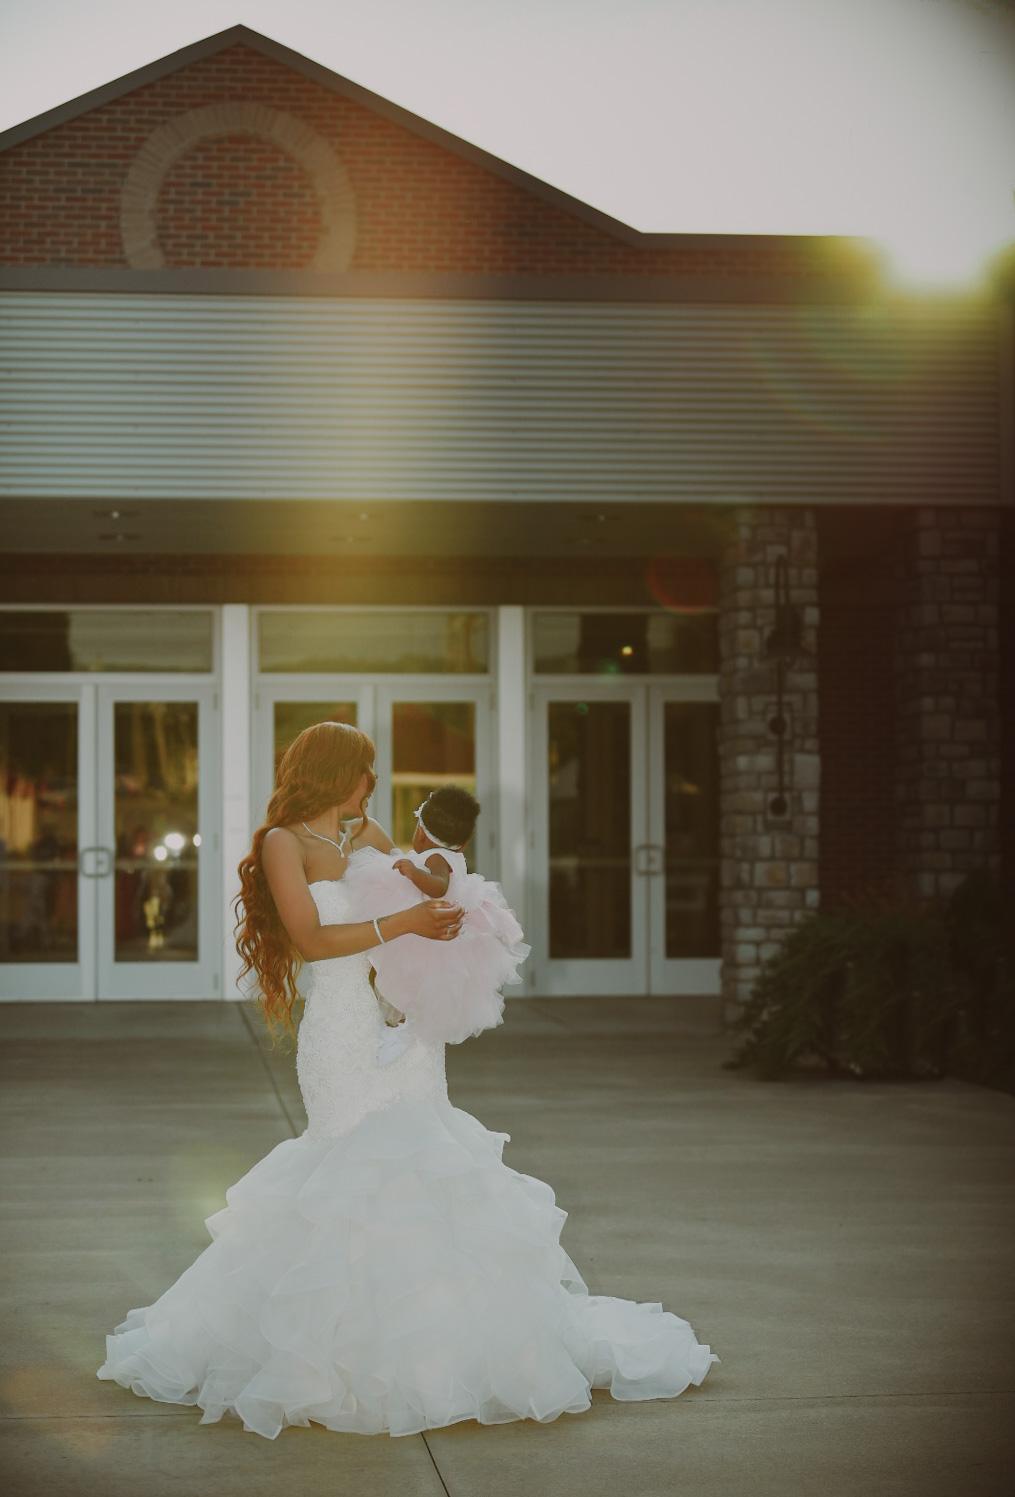 Lebanon Tennessee Wedding by Eye of Fatima Photography